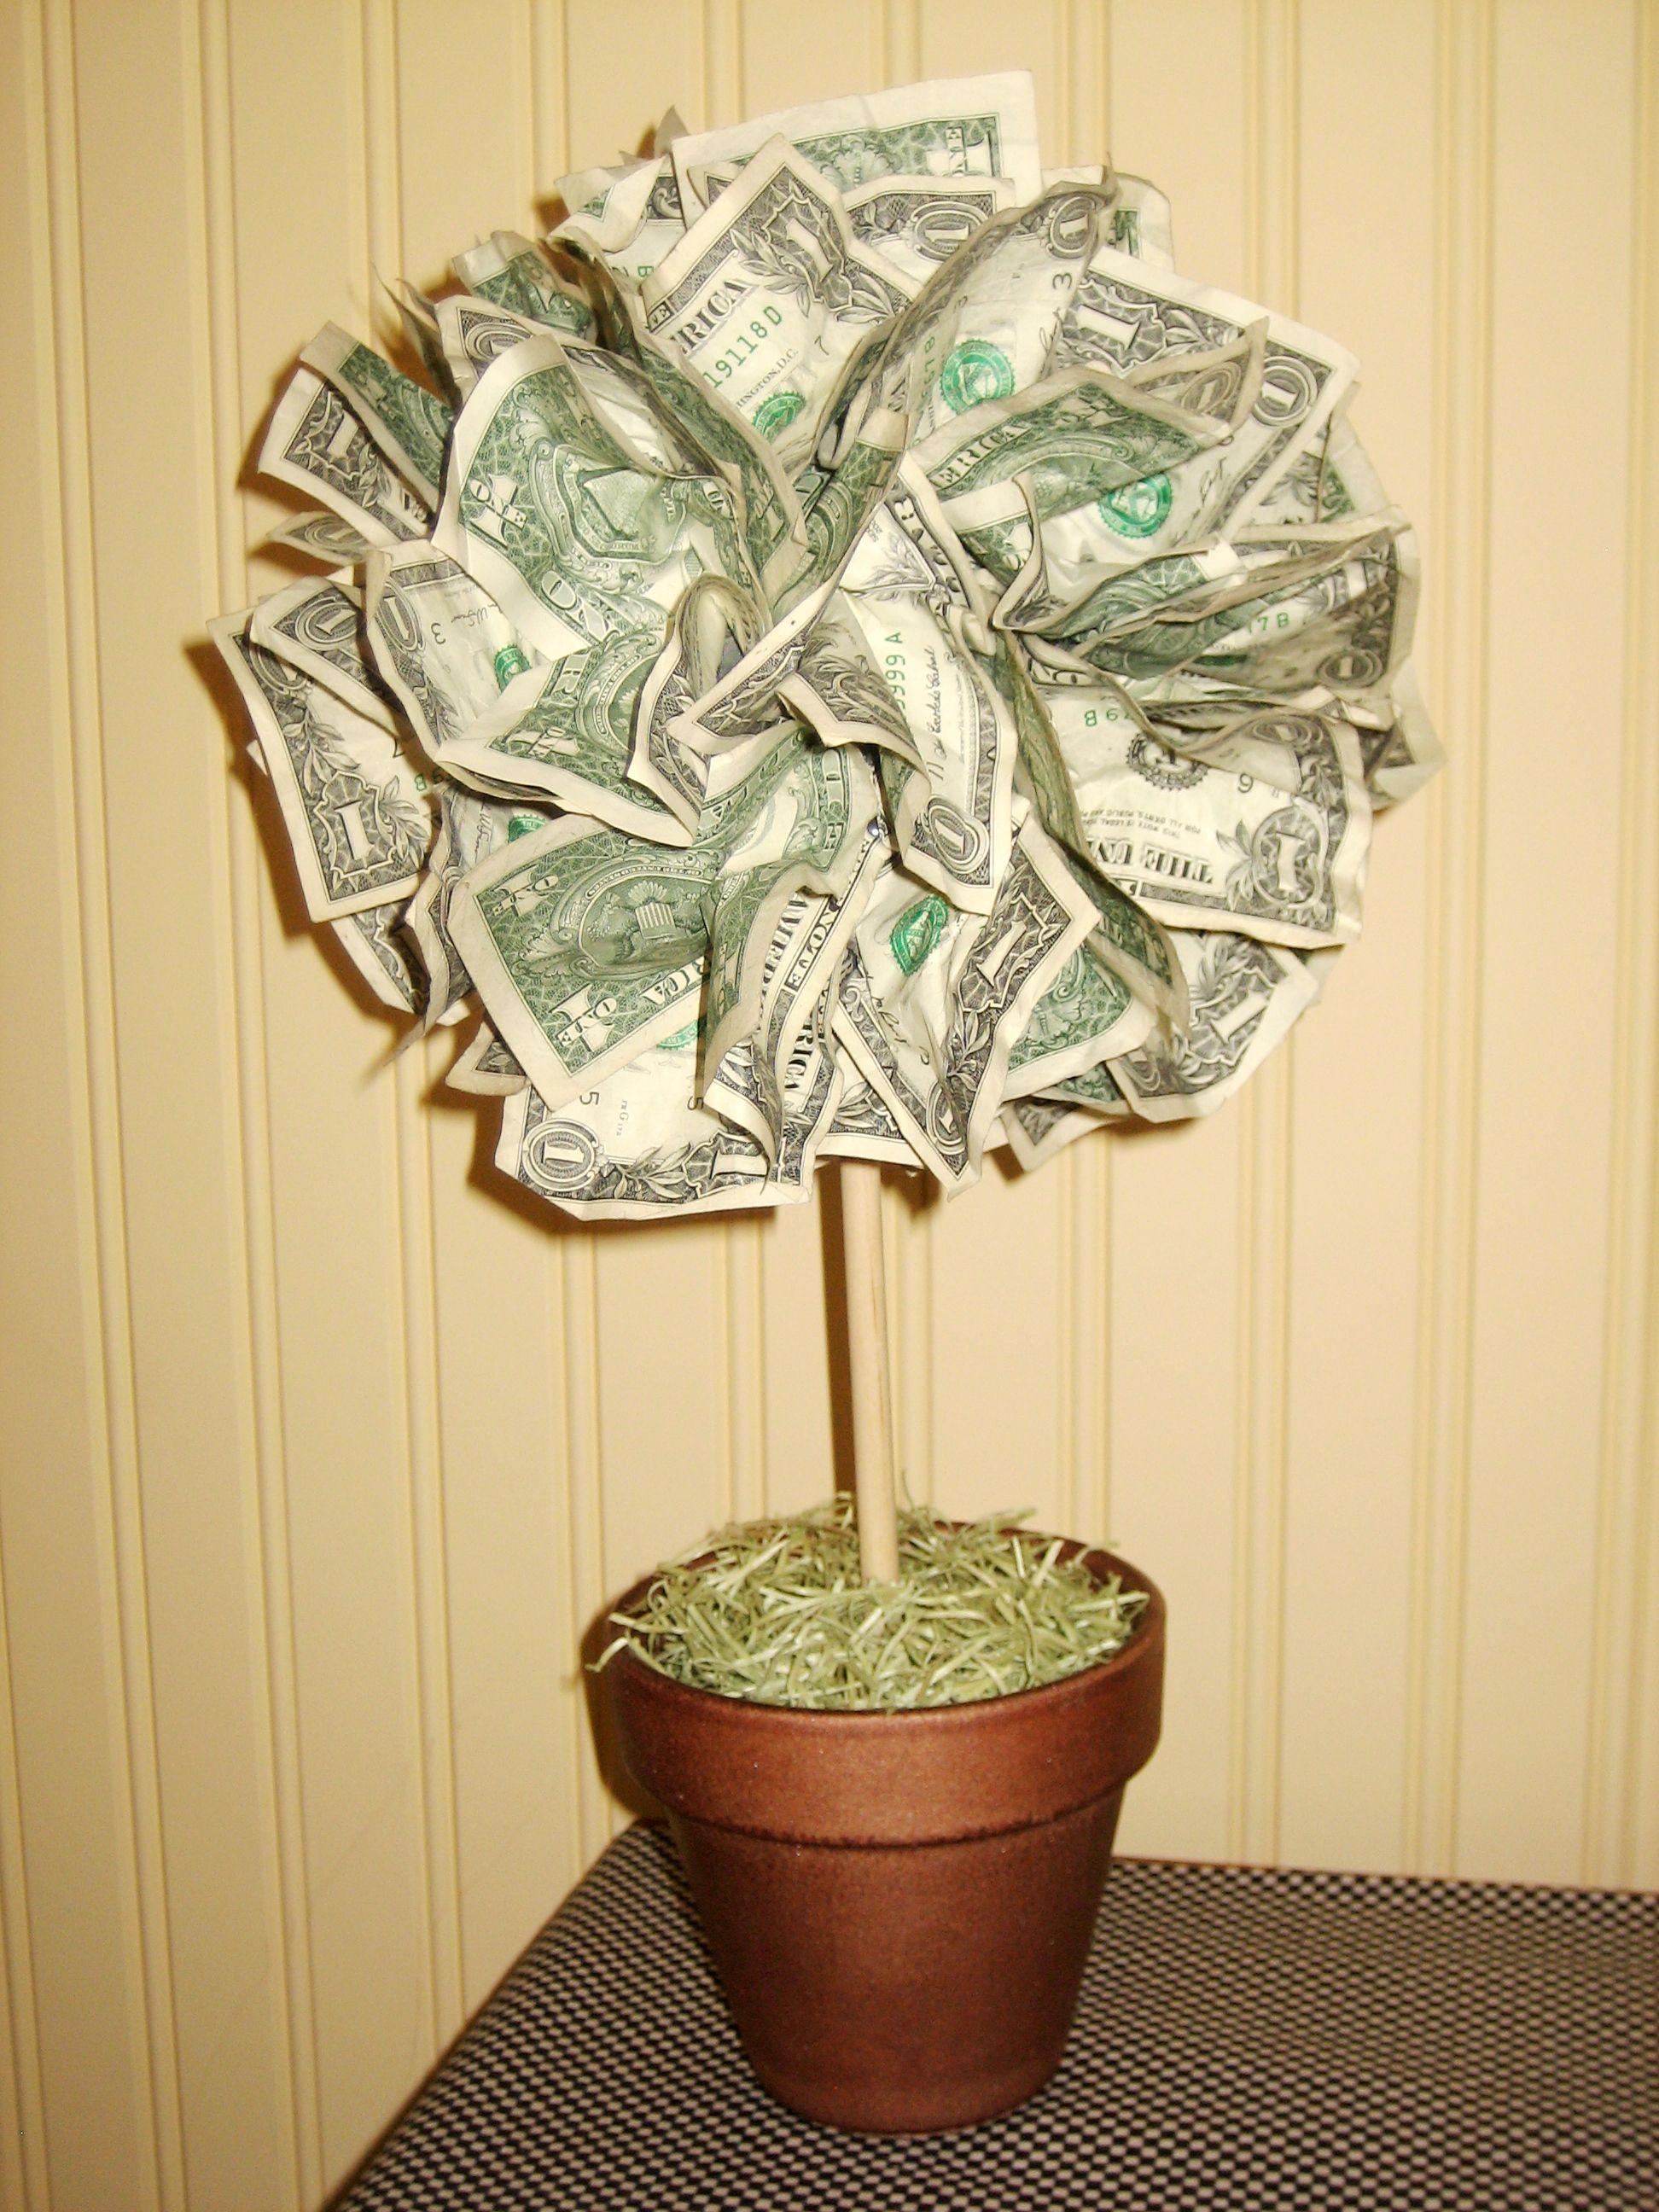 money tree ideas wedding | images of money tree i made for ...